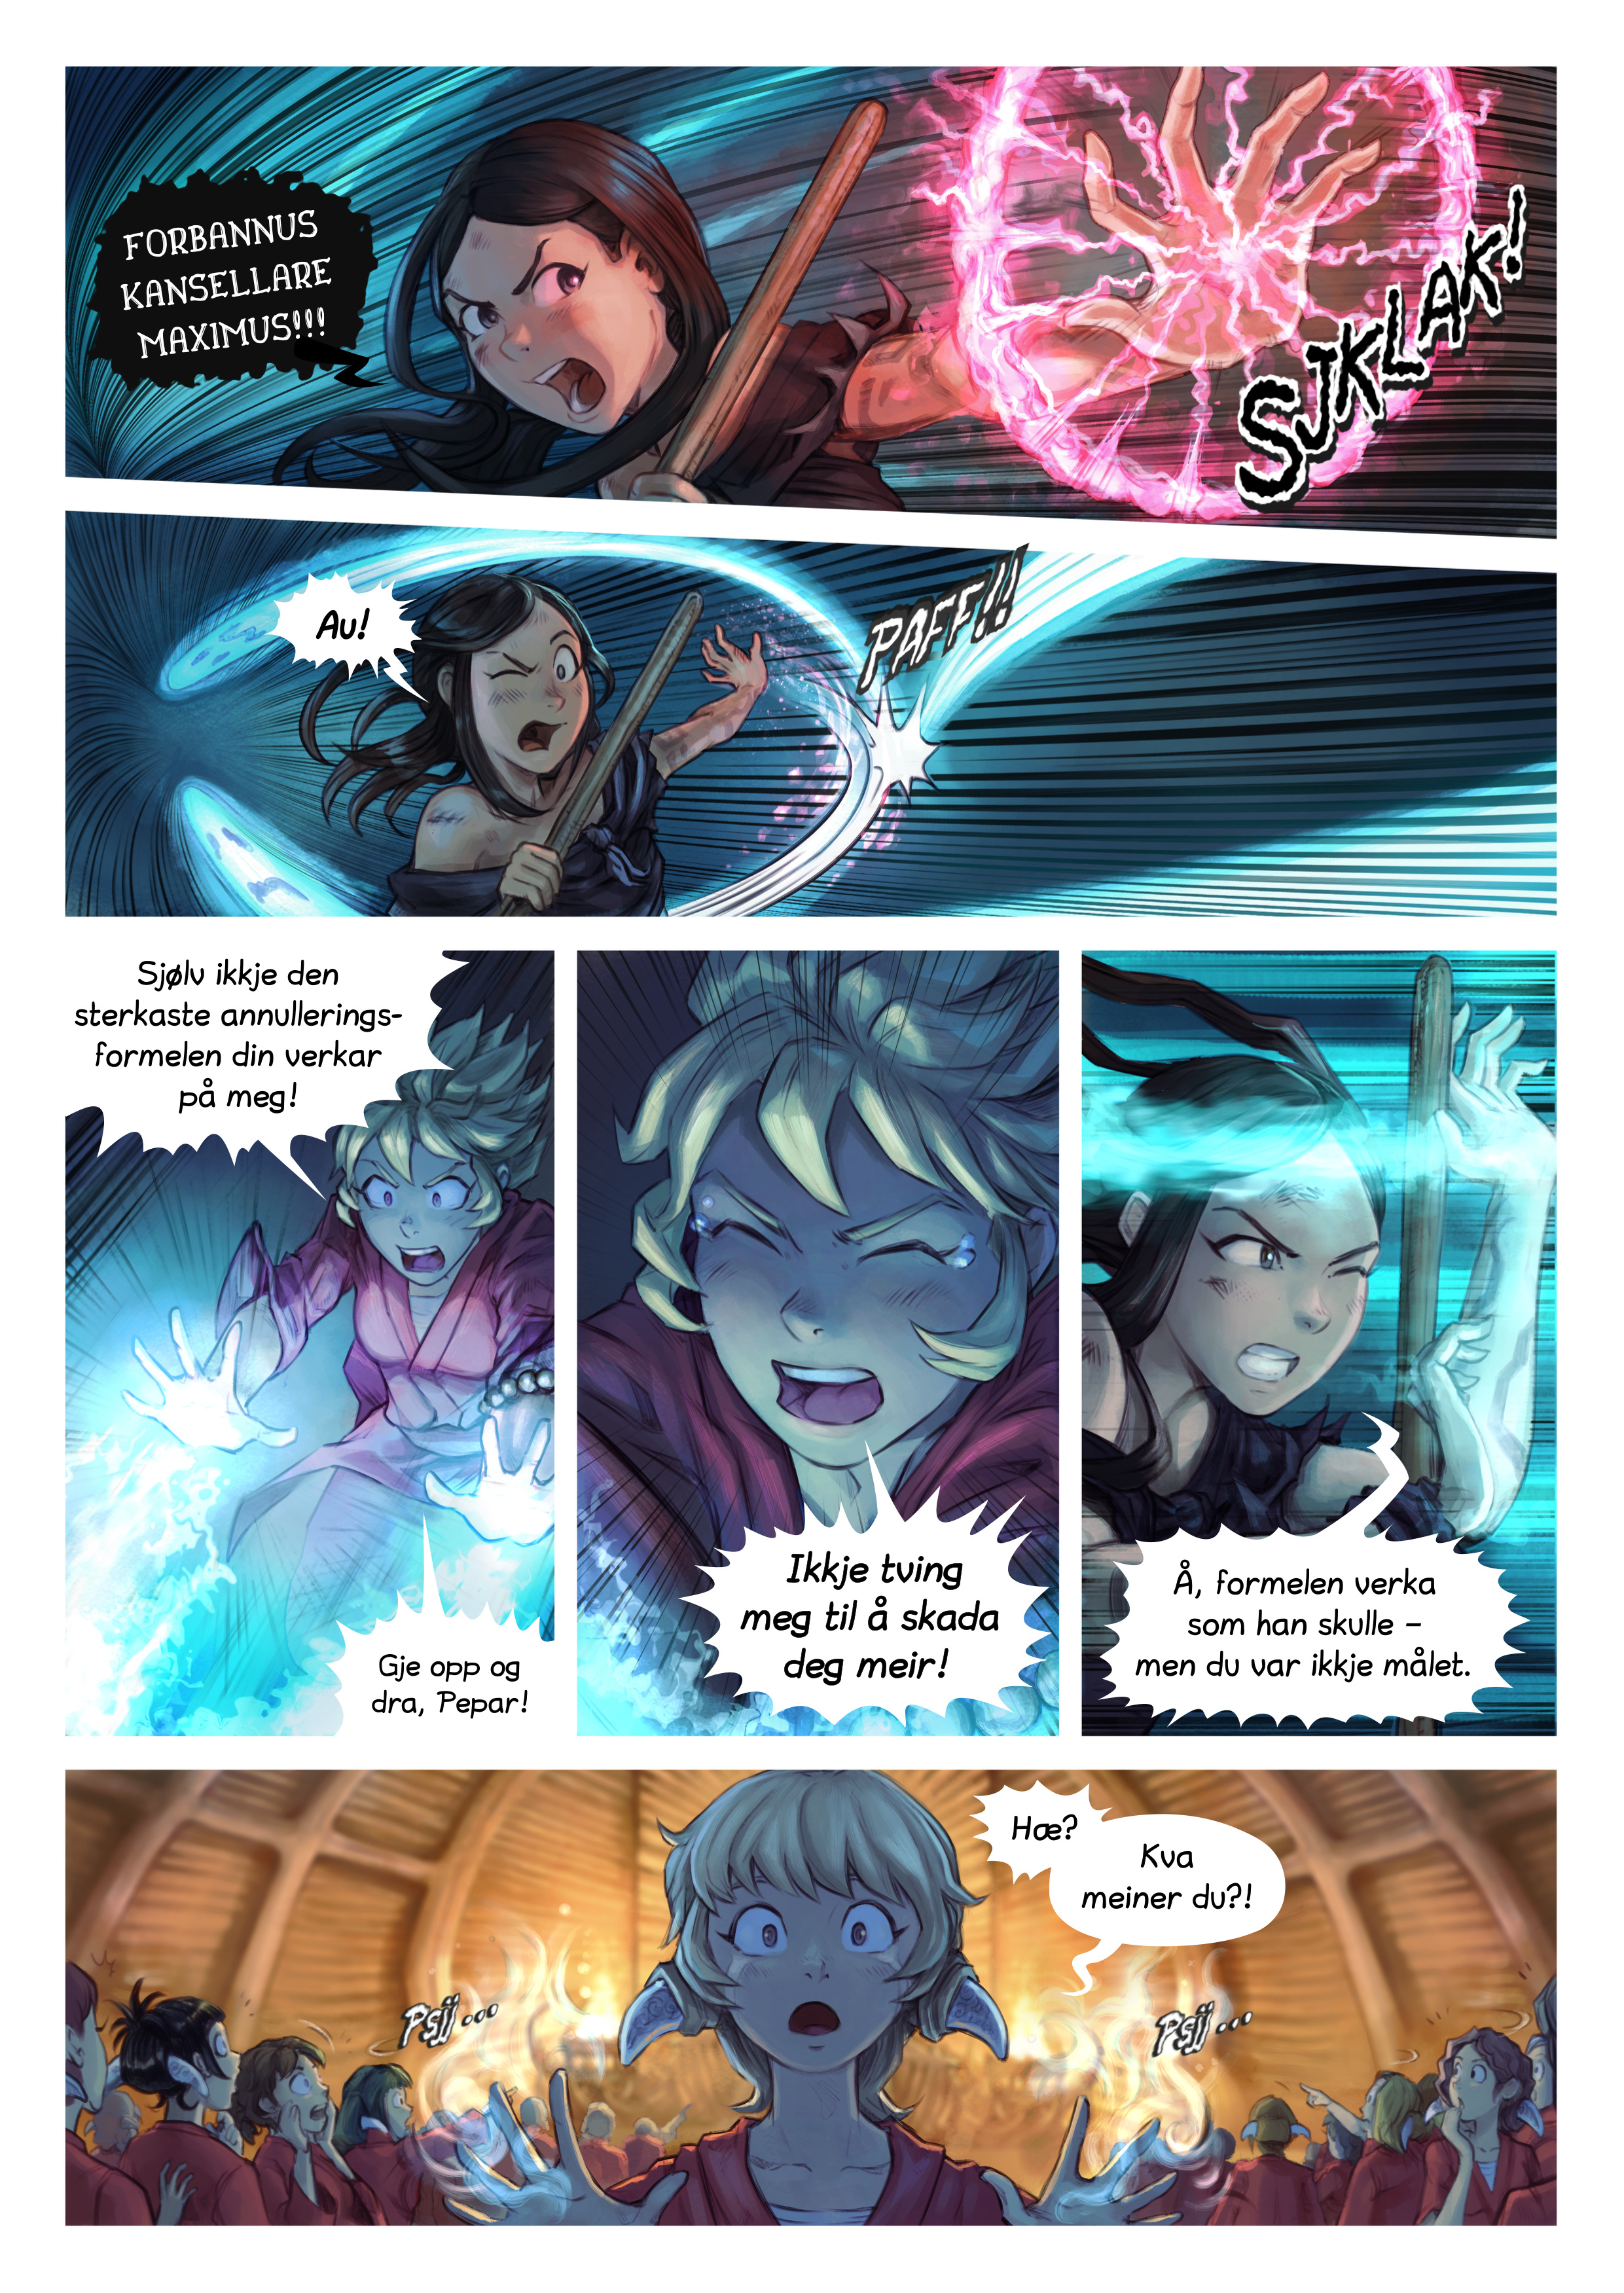 Episode 34: Riddarseremoni for Shichimi, Side 7